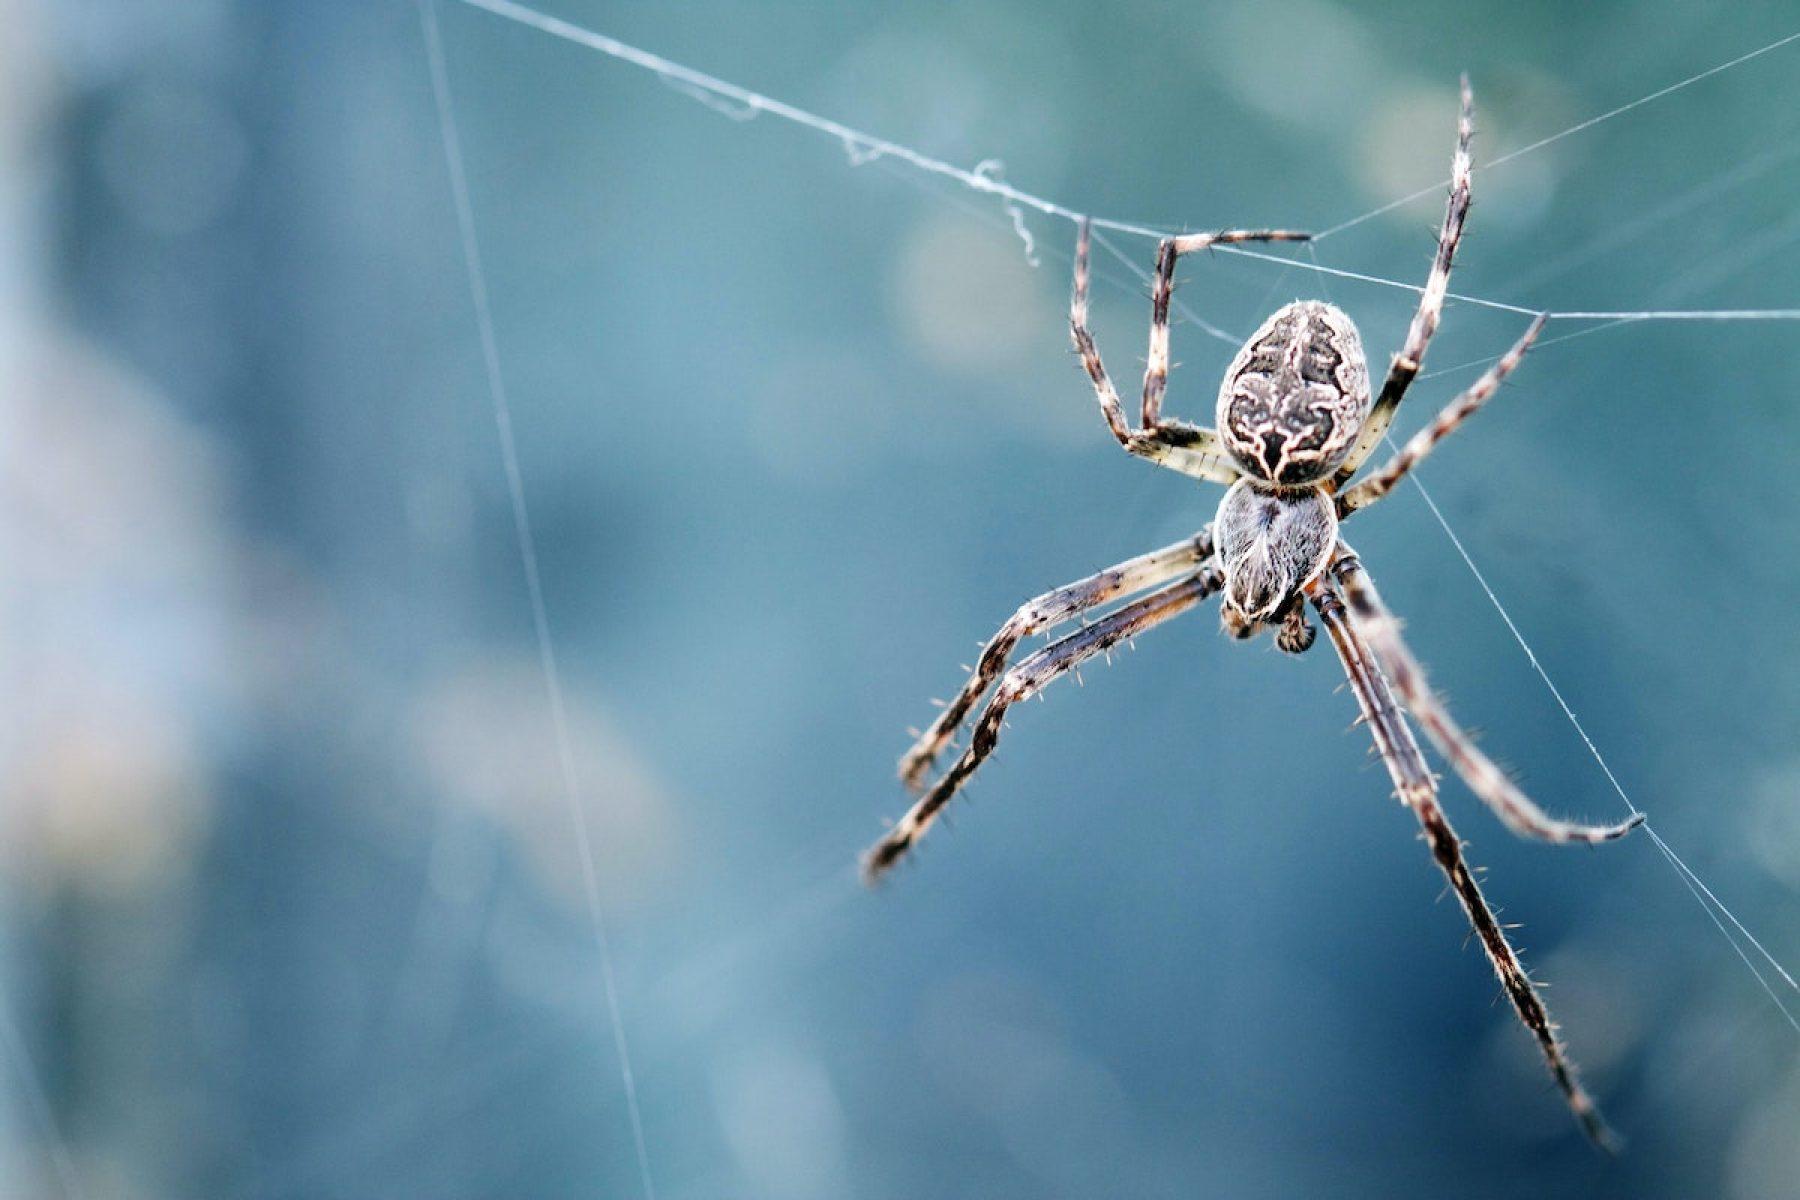 Image for Children's comic competition celebrates 'misunderstood' spiders